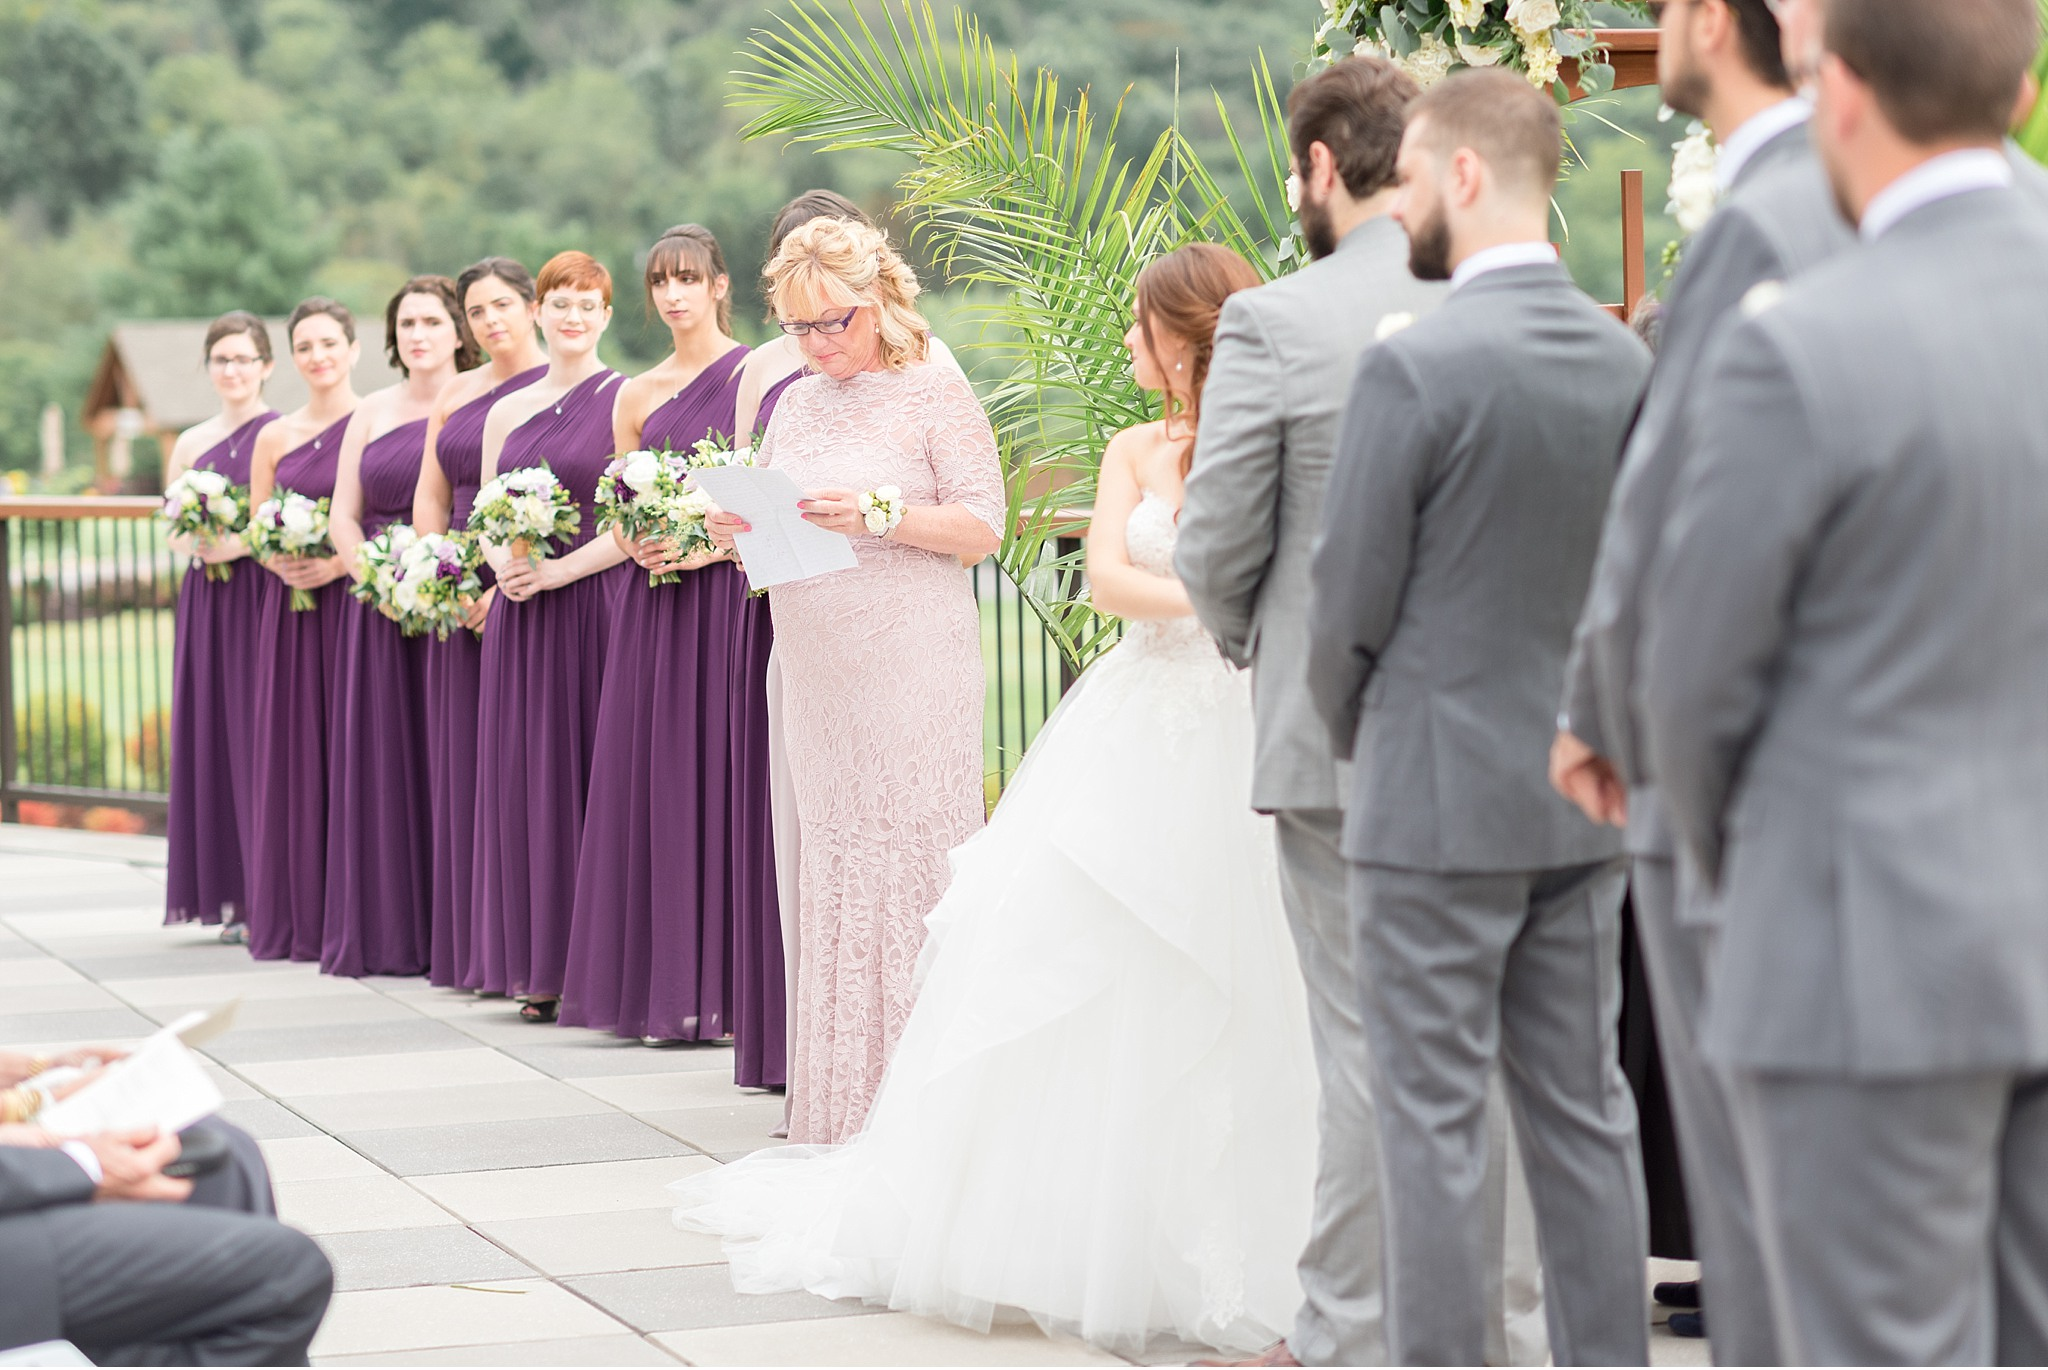 Elegant Ski Liberty Resort Fairfiled PA wedding photography photo_2188.jpg